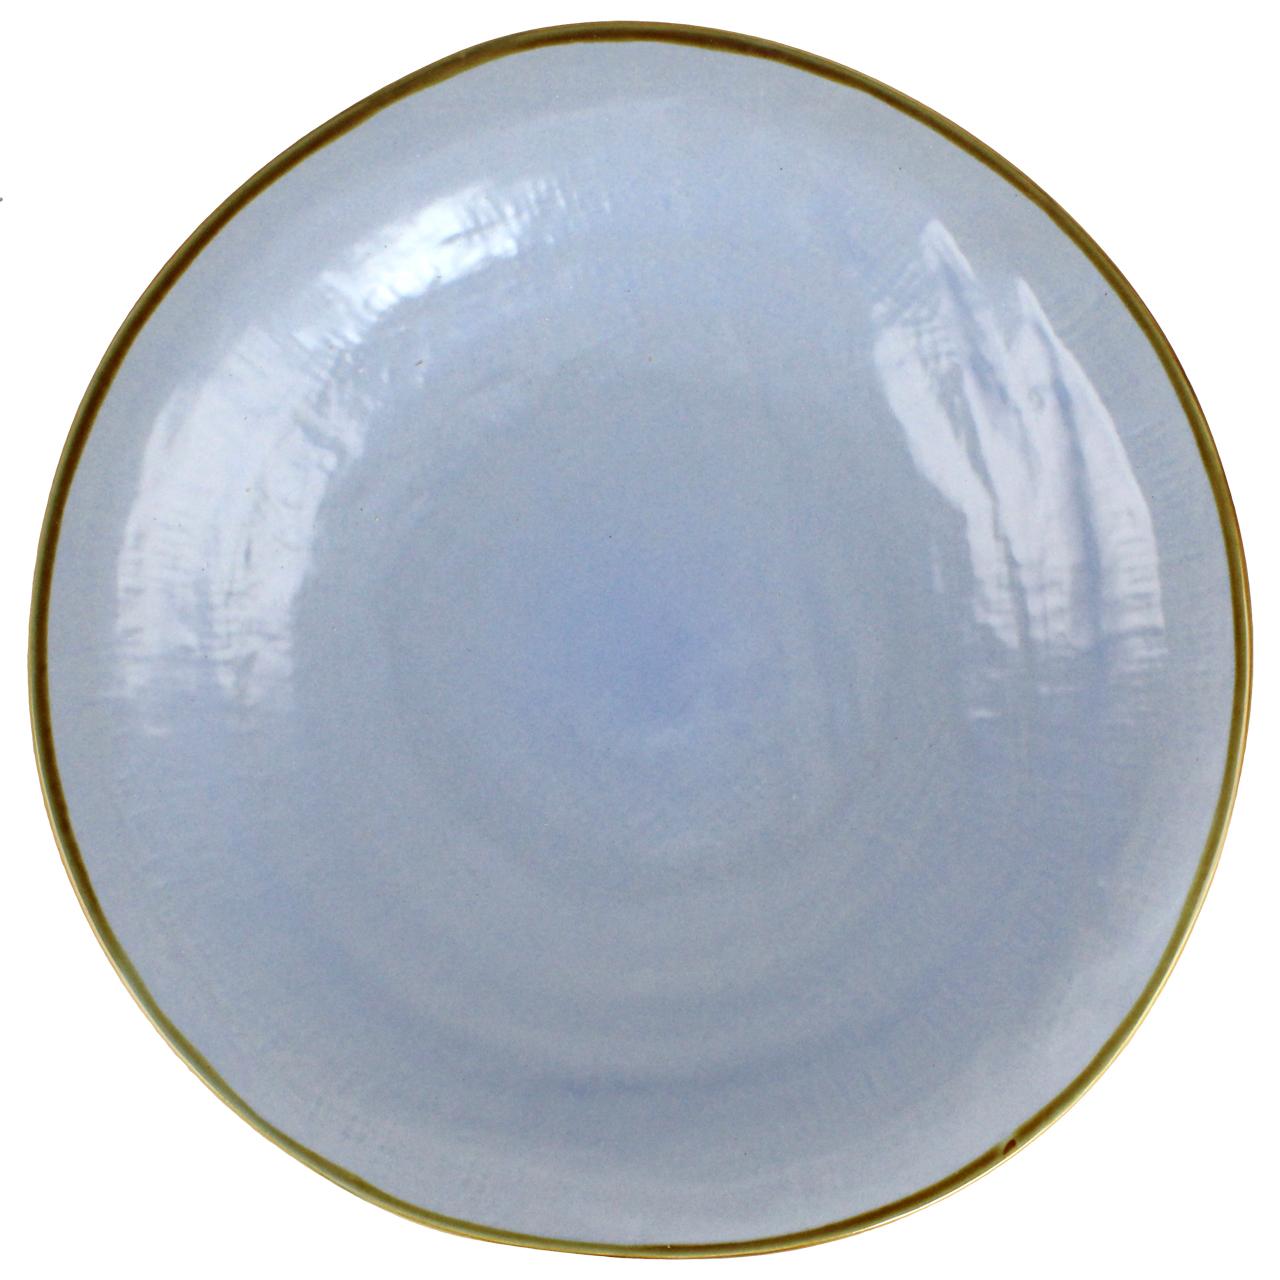 Farfurie Adanca Din Ceramica Albastra Deschis